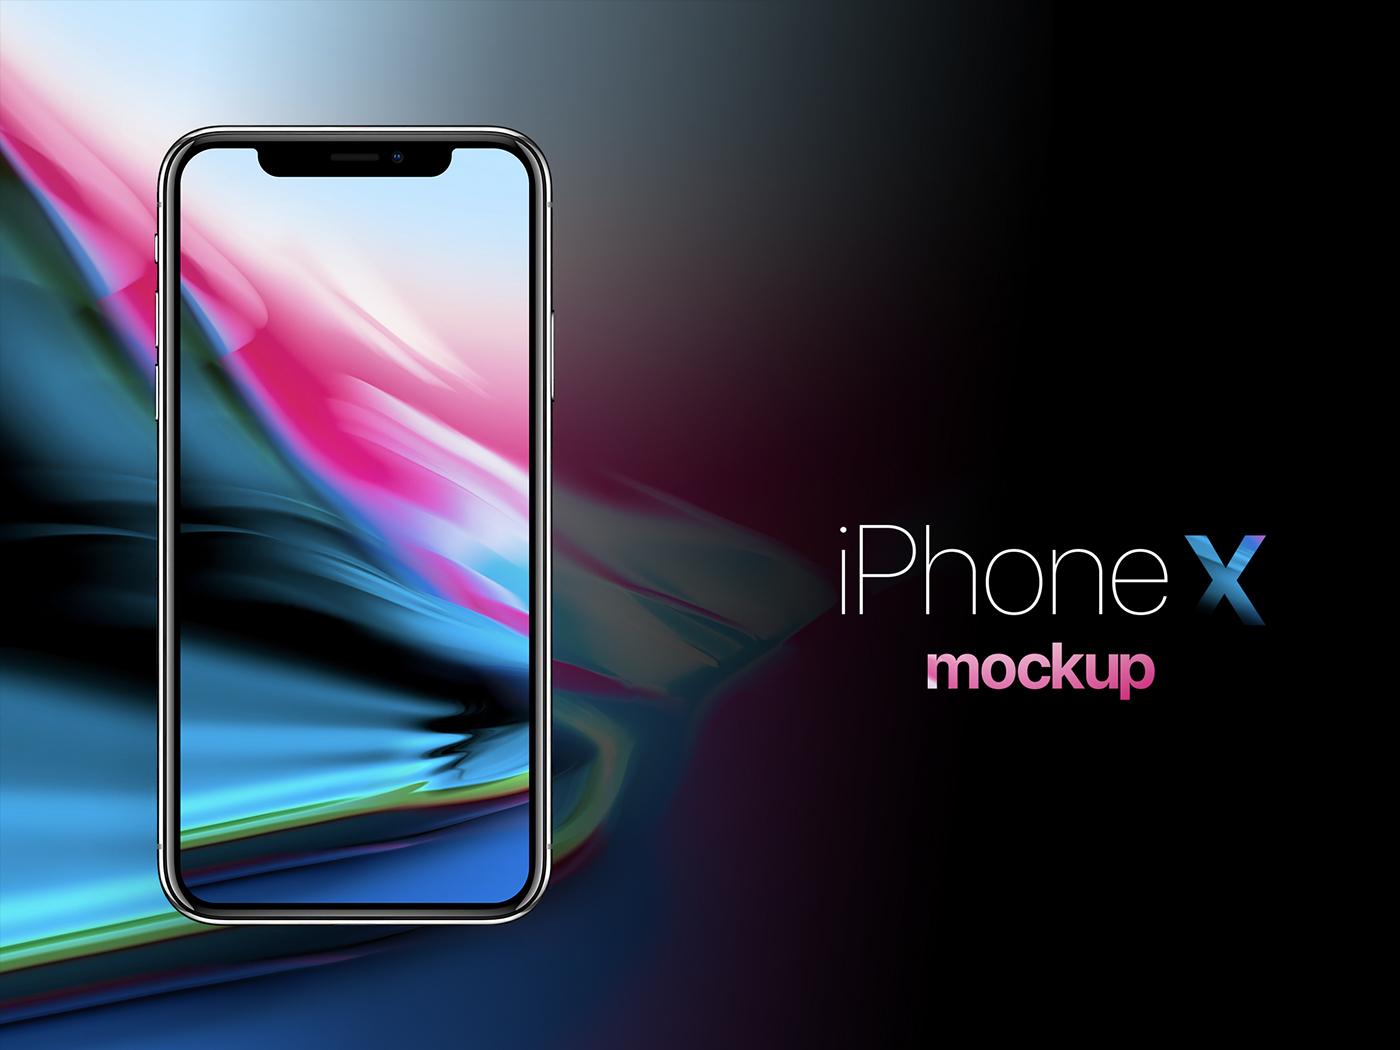 iPhone X free mockup on Behance